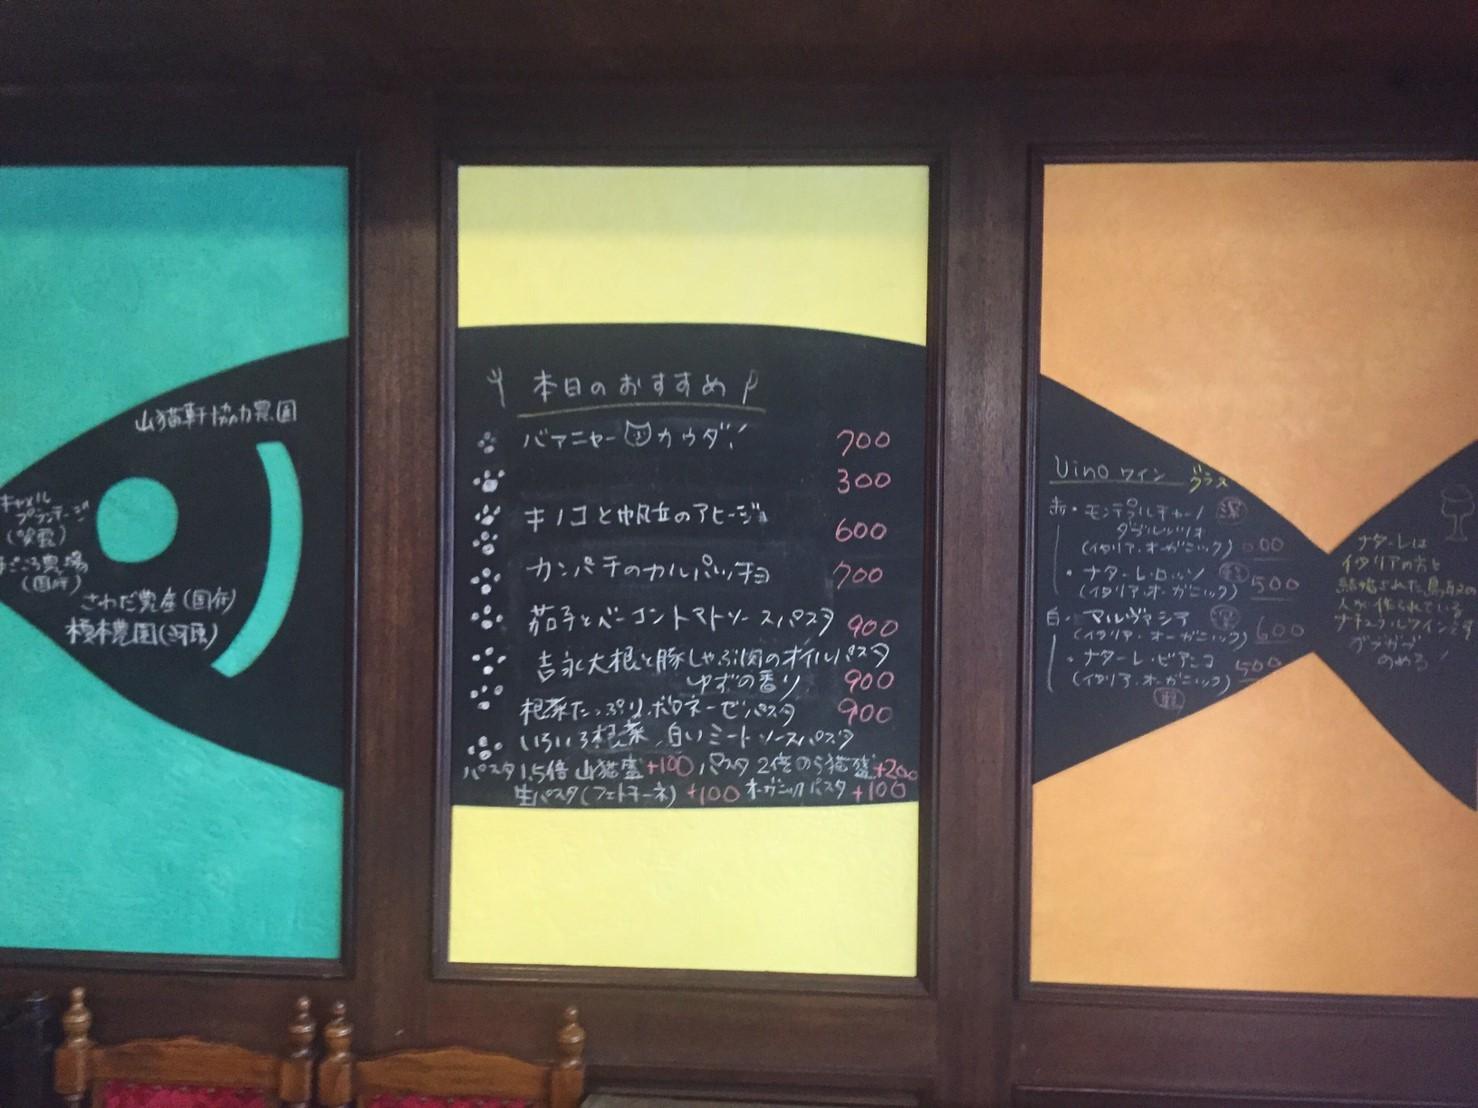 Vineria 農楽ttoria 山猫軒  荻ちゃんとランチ_e0115904_05270640.jpg